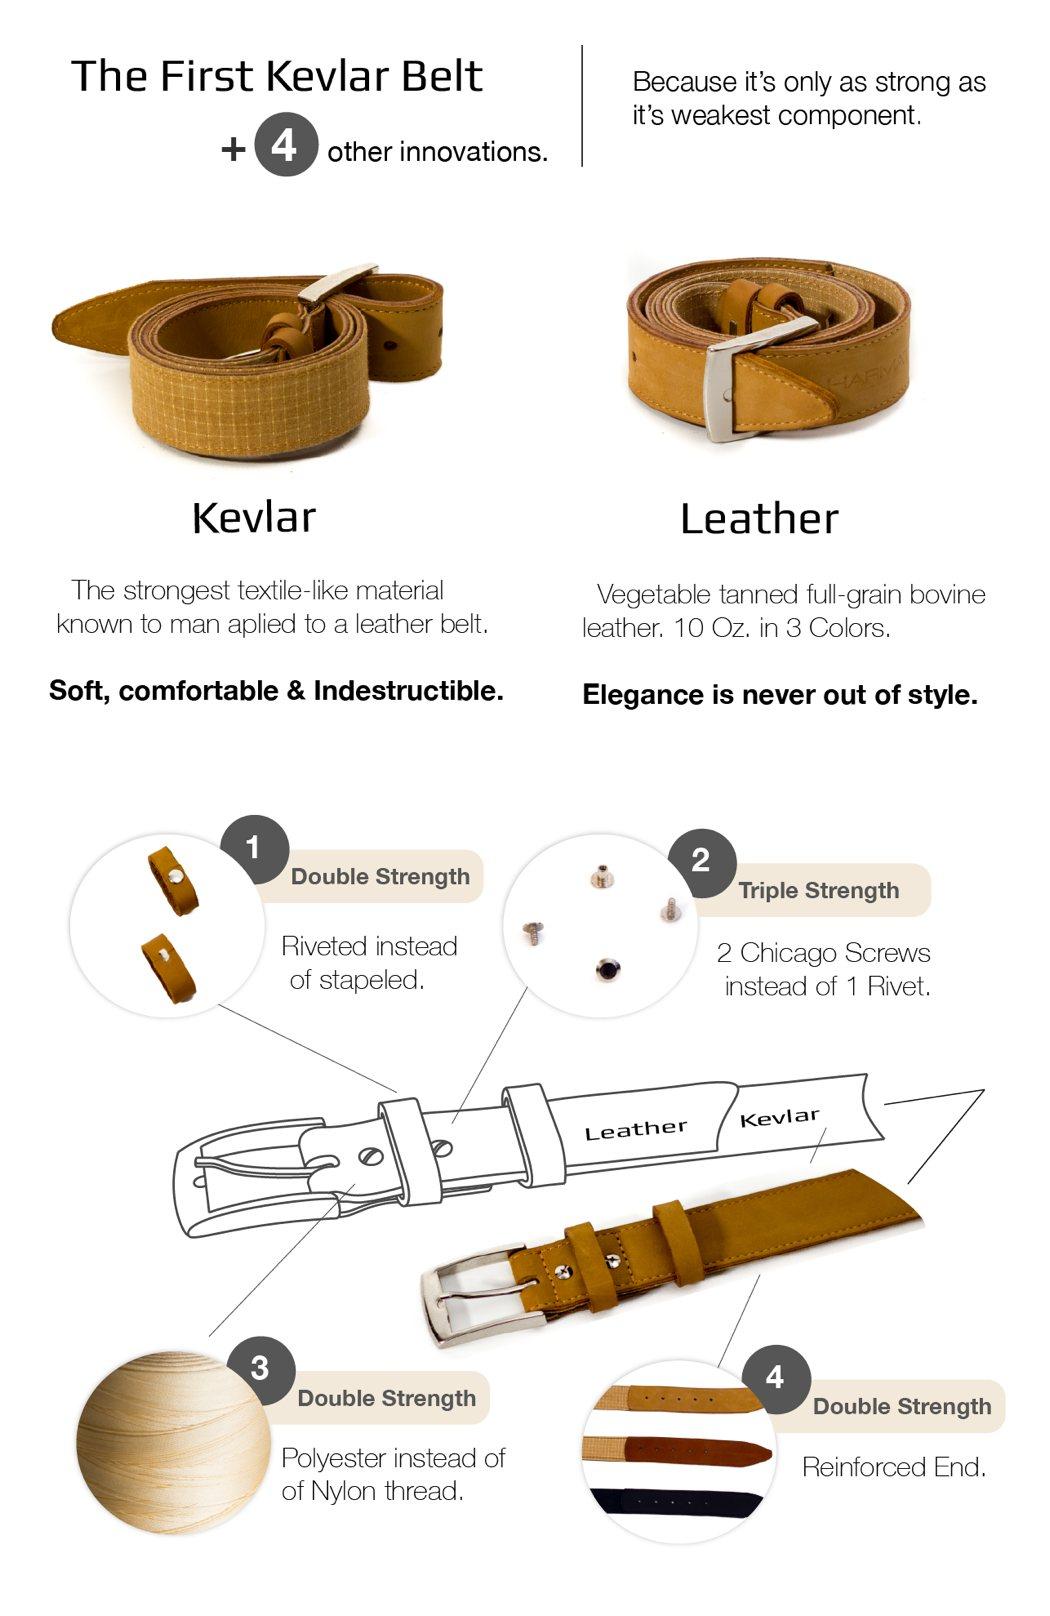 kevlar_leather3